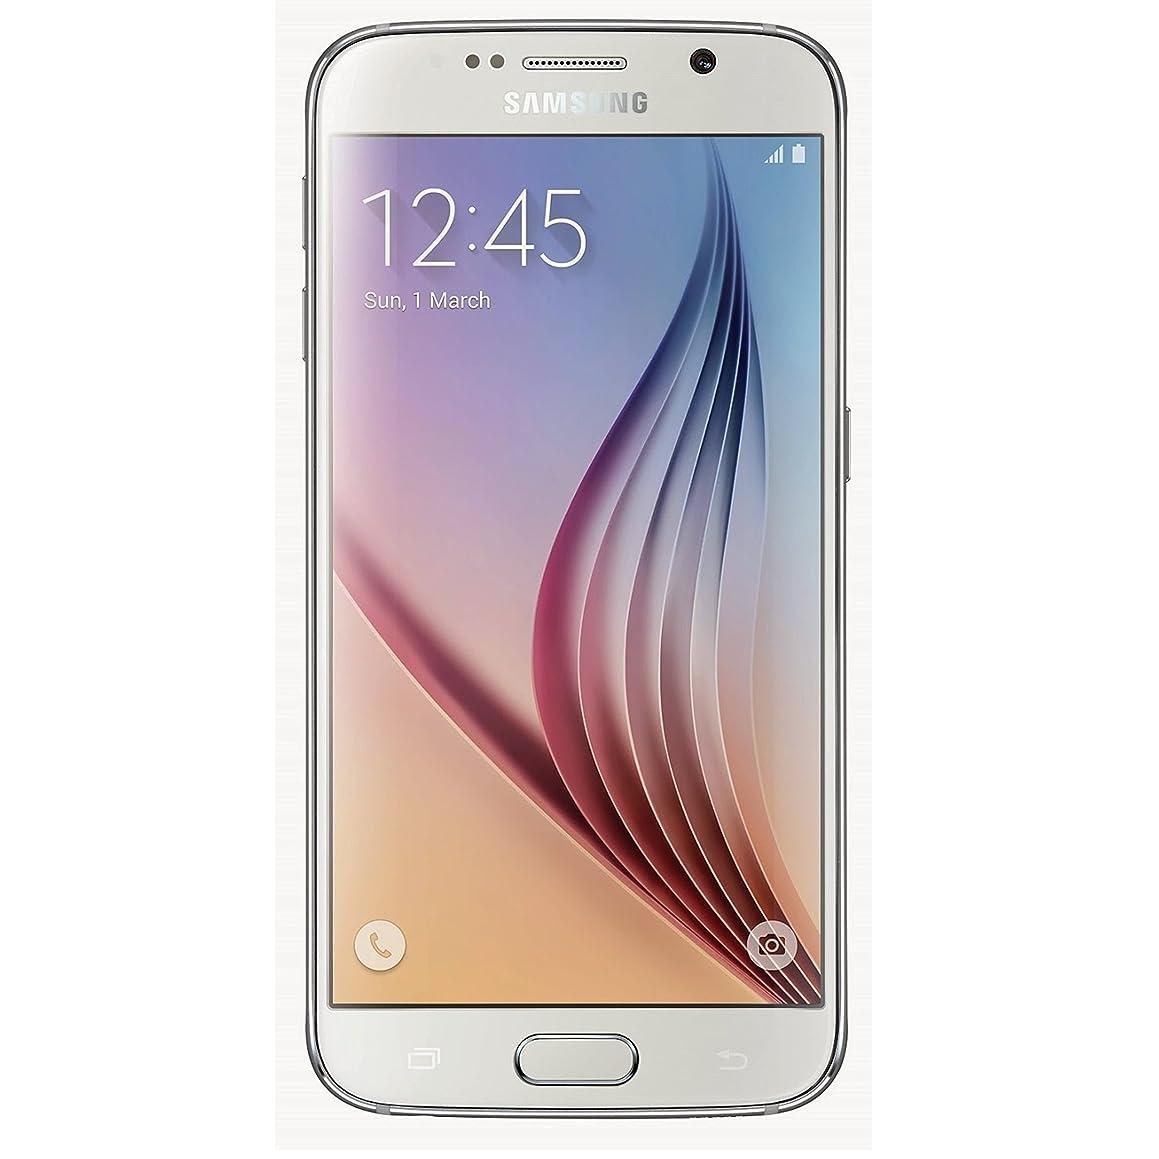 Samsung Galaxy S6 SM-G920F Factory Unlocked Cellphone, International Version, 32GB, White